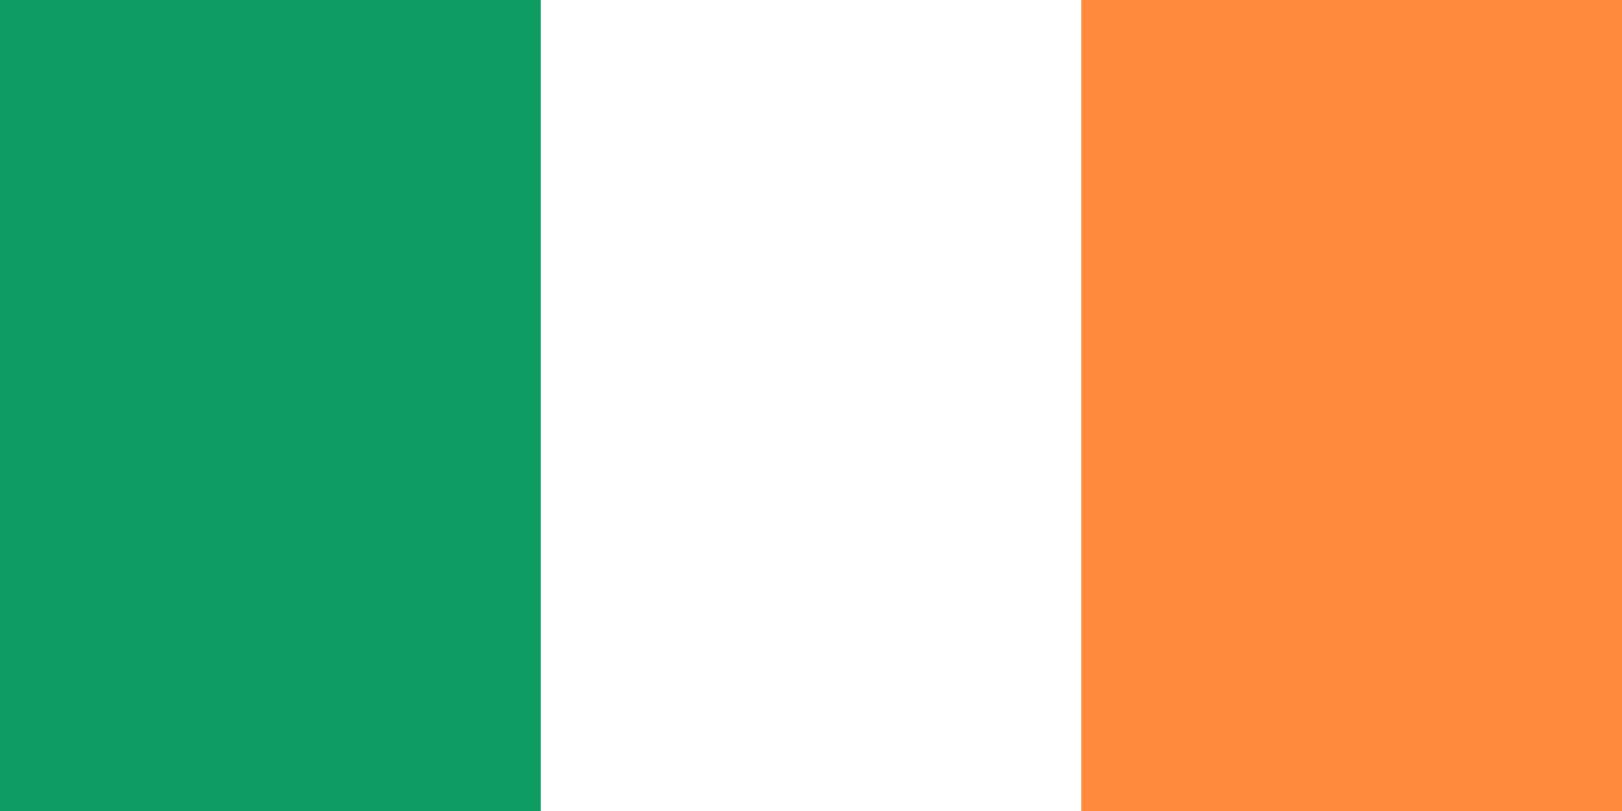 Flagge im Querformat Land Irland150x100 cm